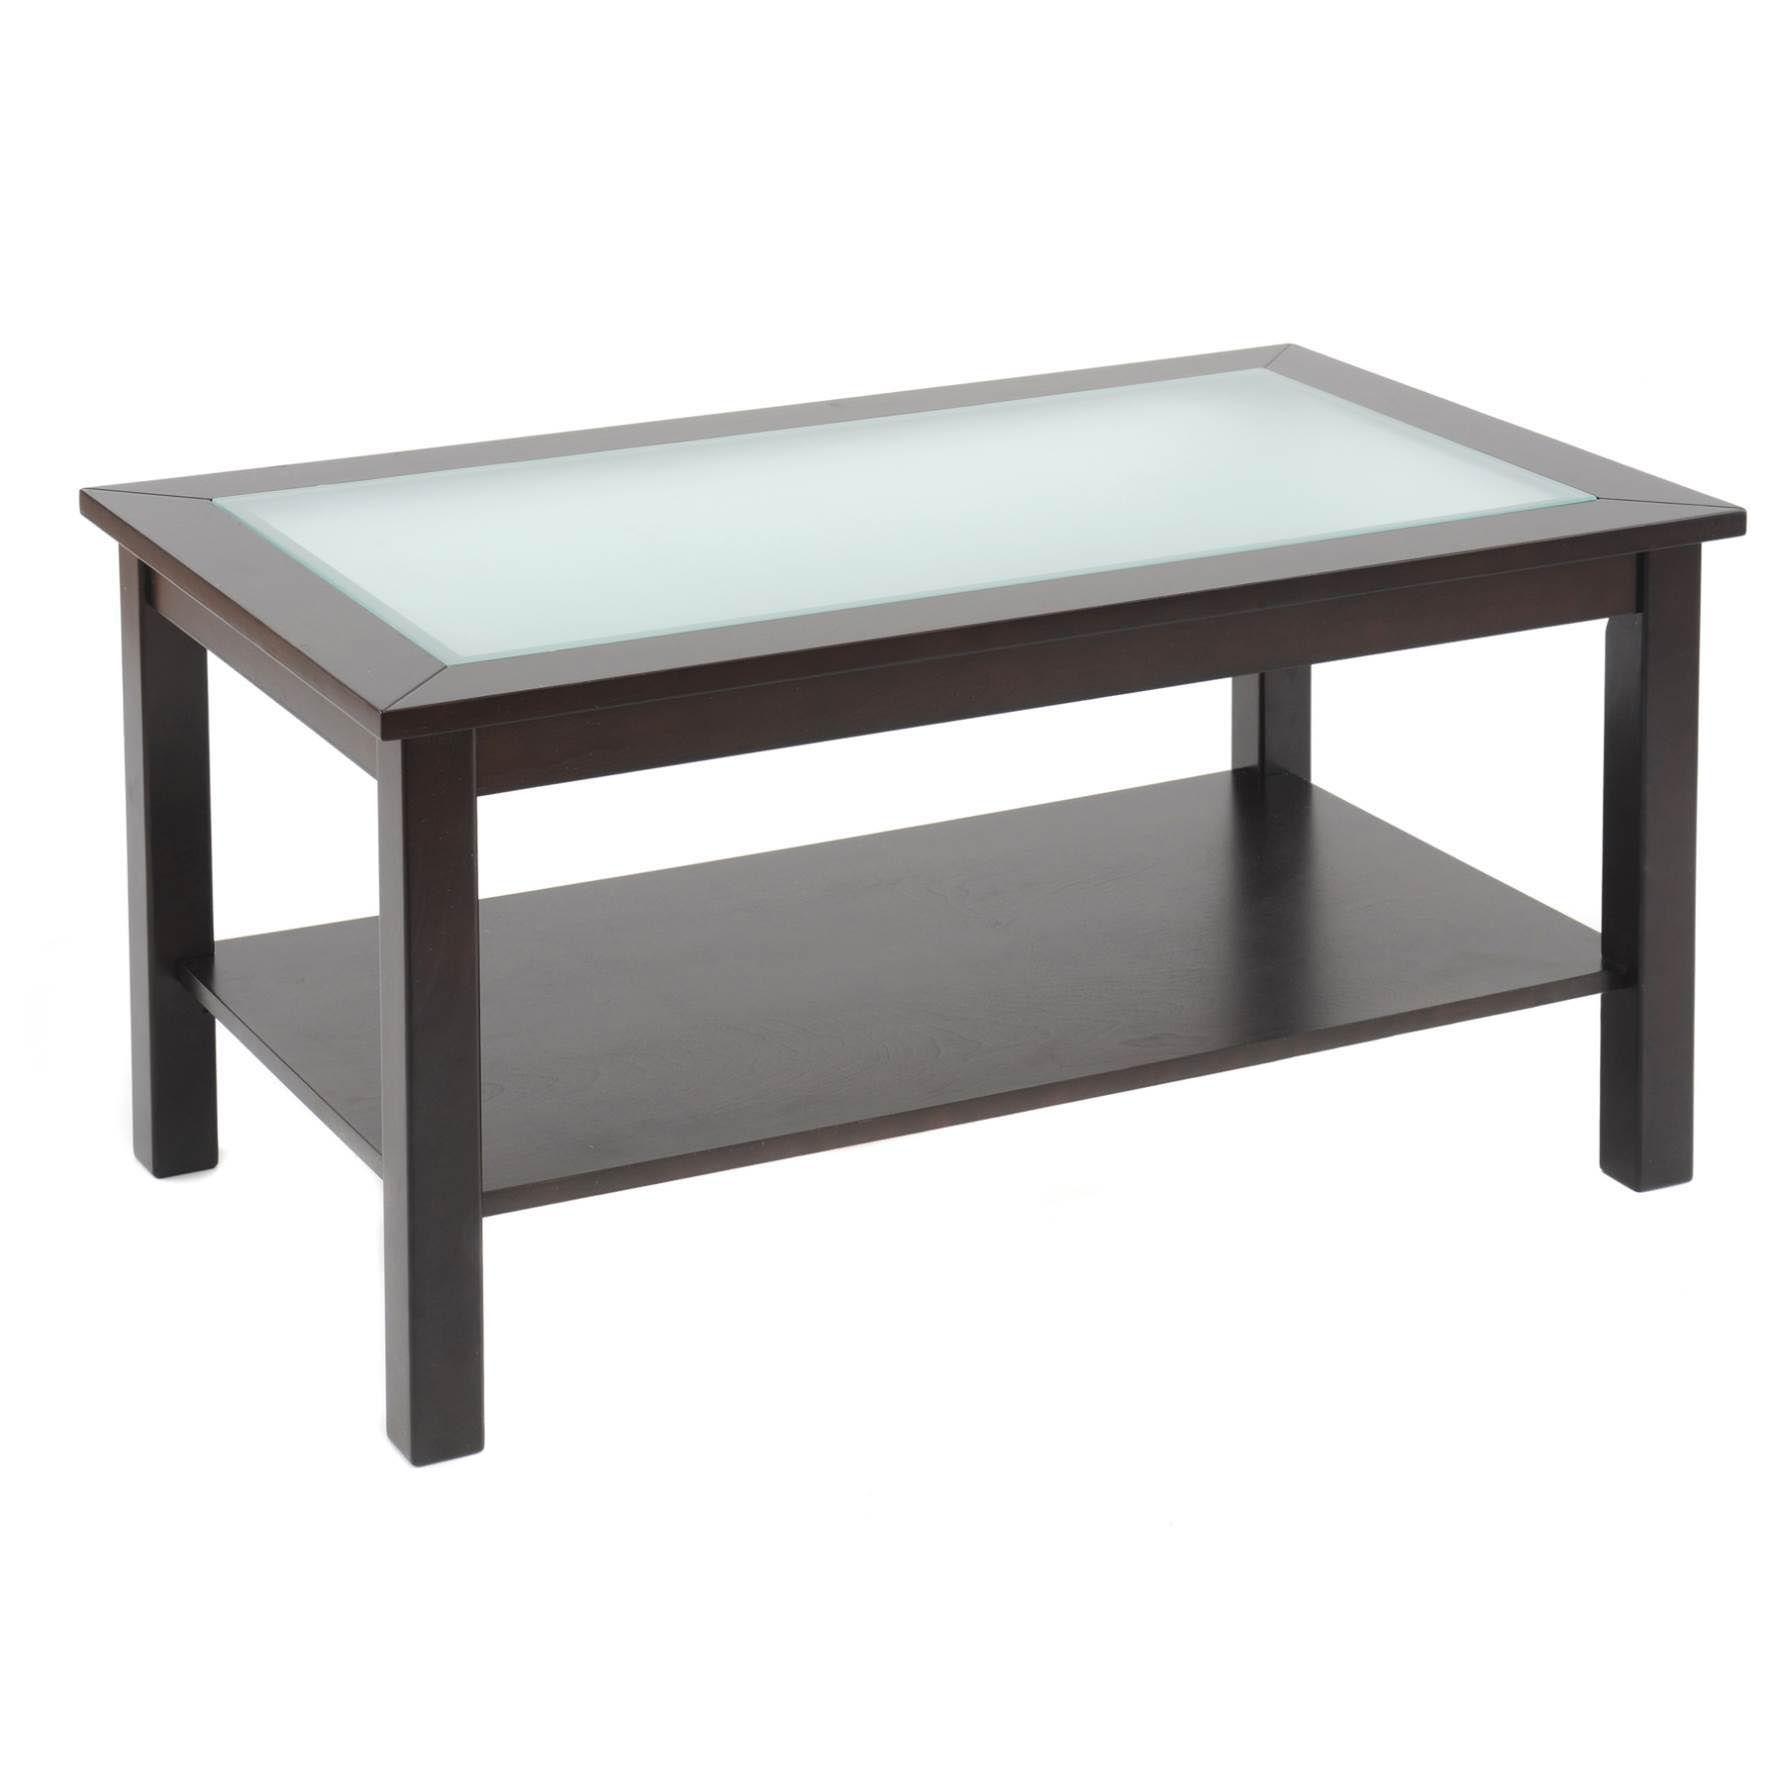 Black Wrought Iron Coffee Table With Glass Top Download Glass Coffee Table Designs Glass Disp Kaki Meja Meja Ruang Tamu Meja Kayu [ 1782 x 1782 Pixel ]